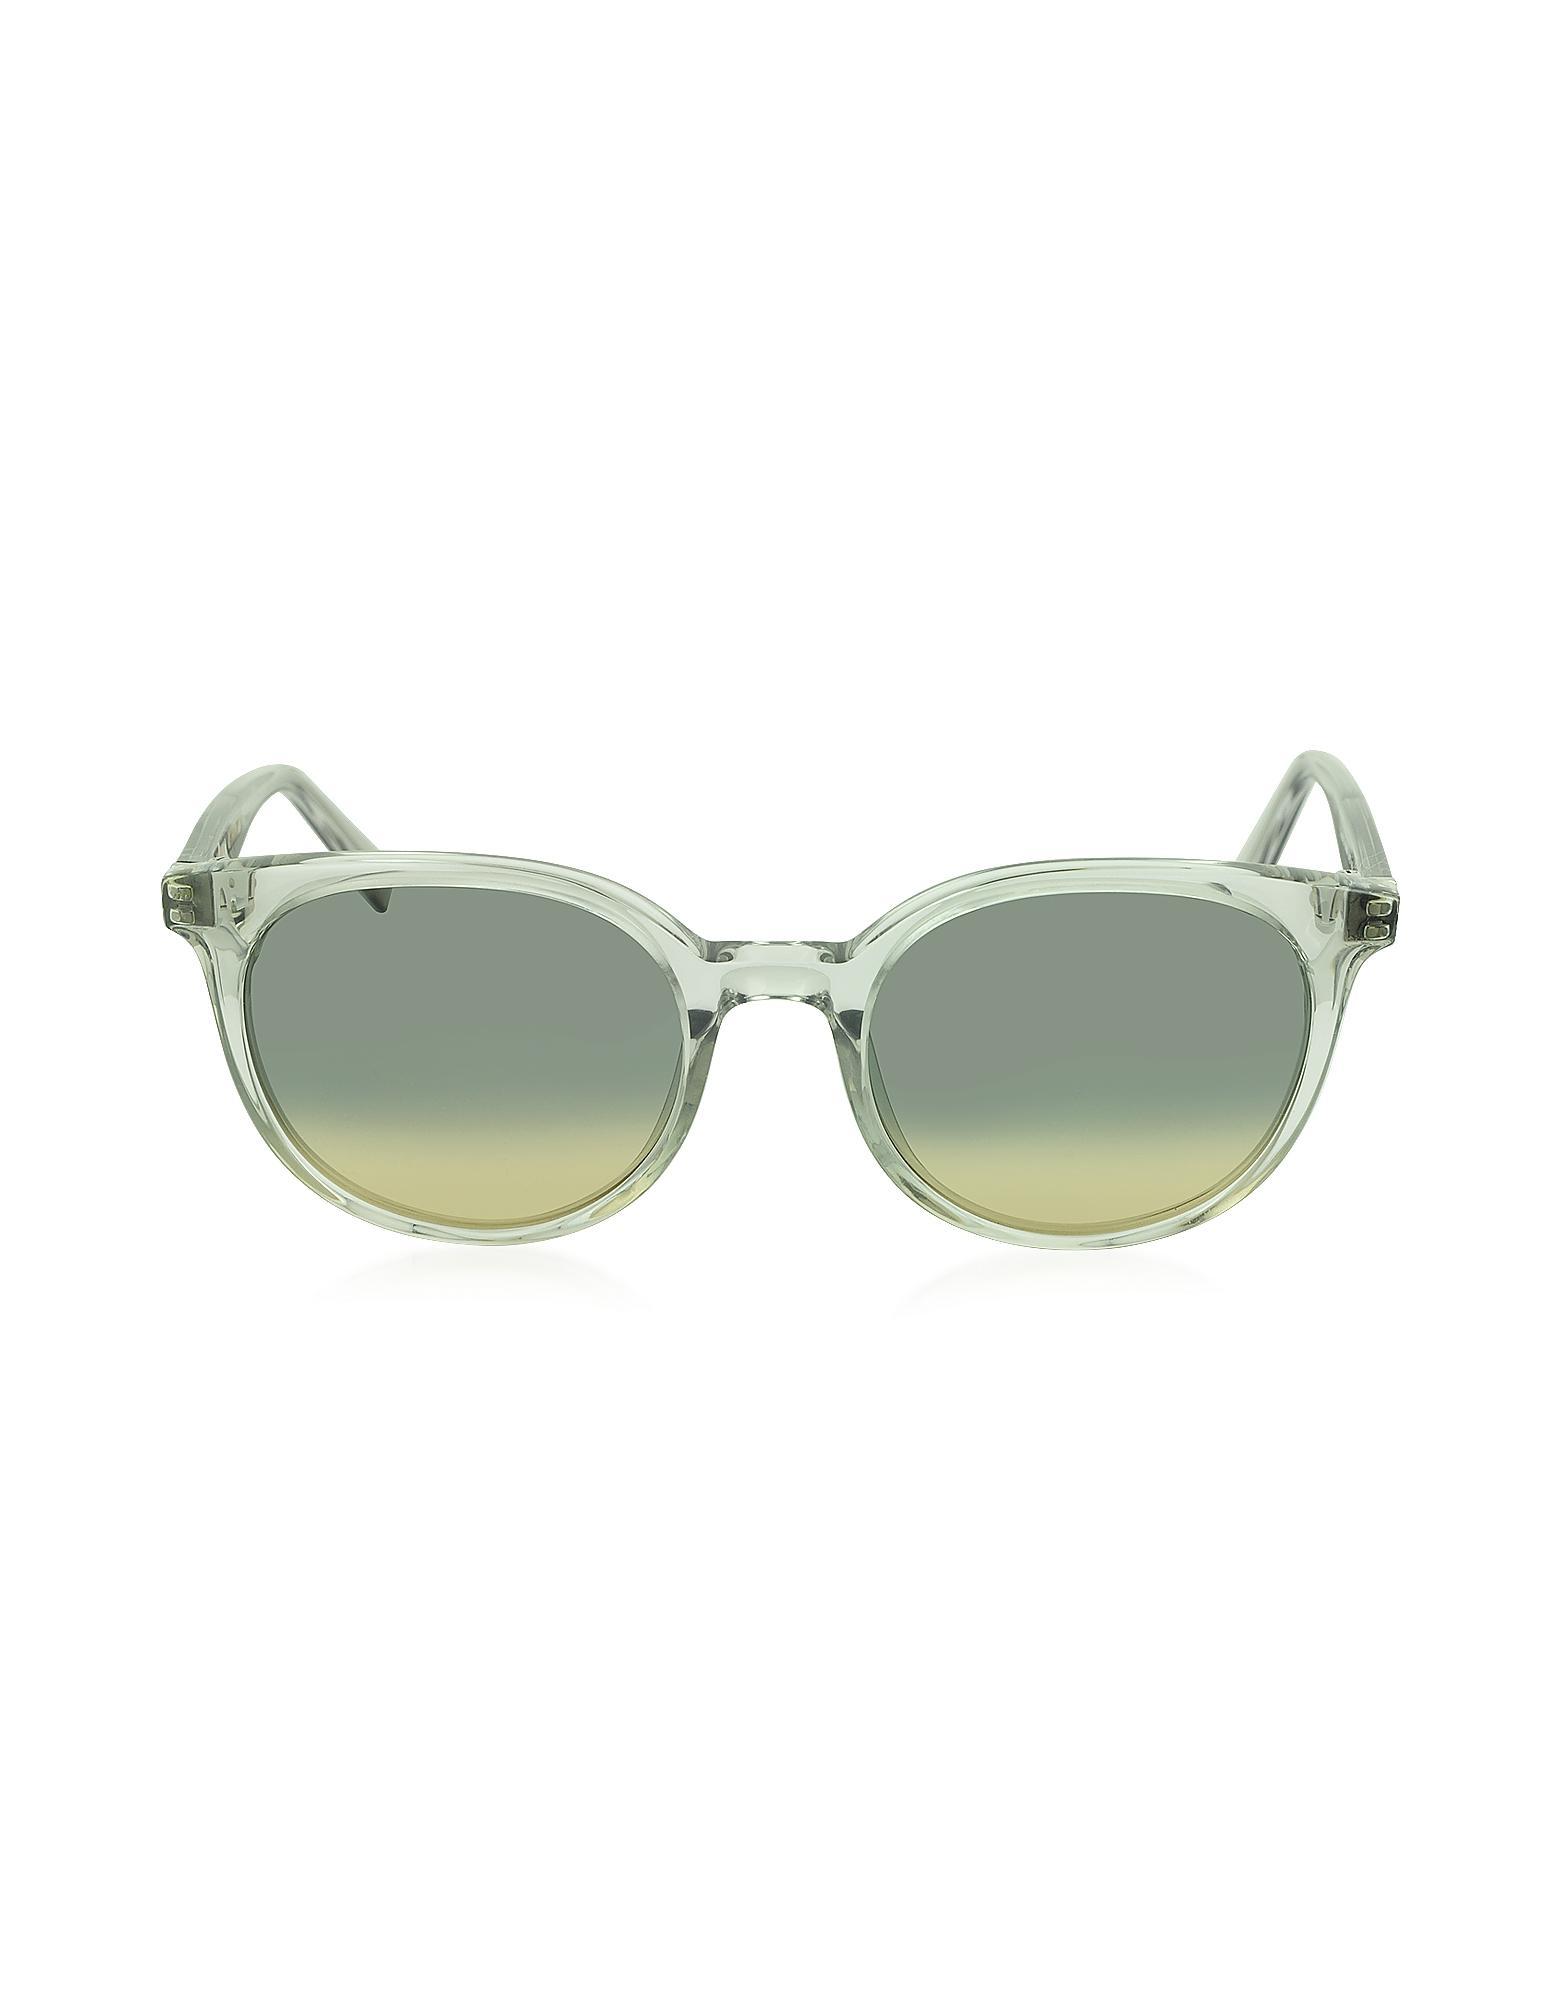 6b95bd91256 celine sunglasses